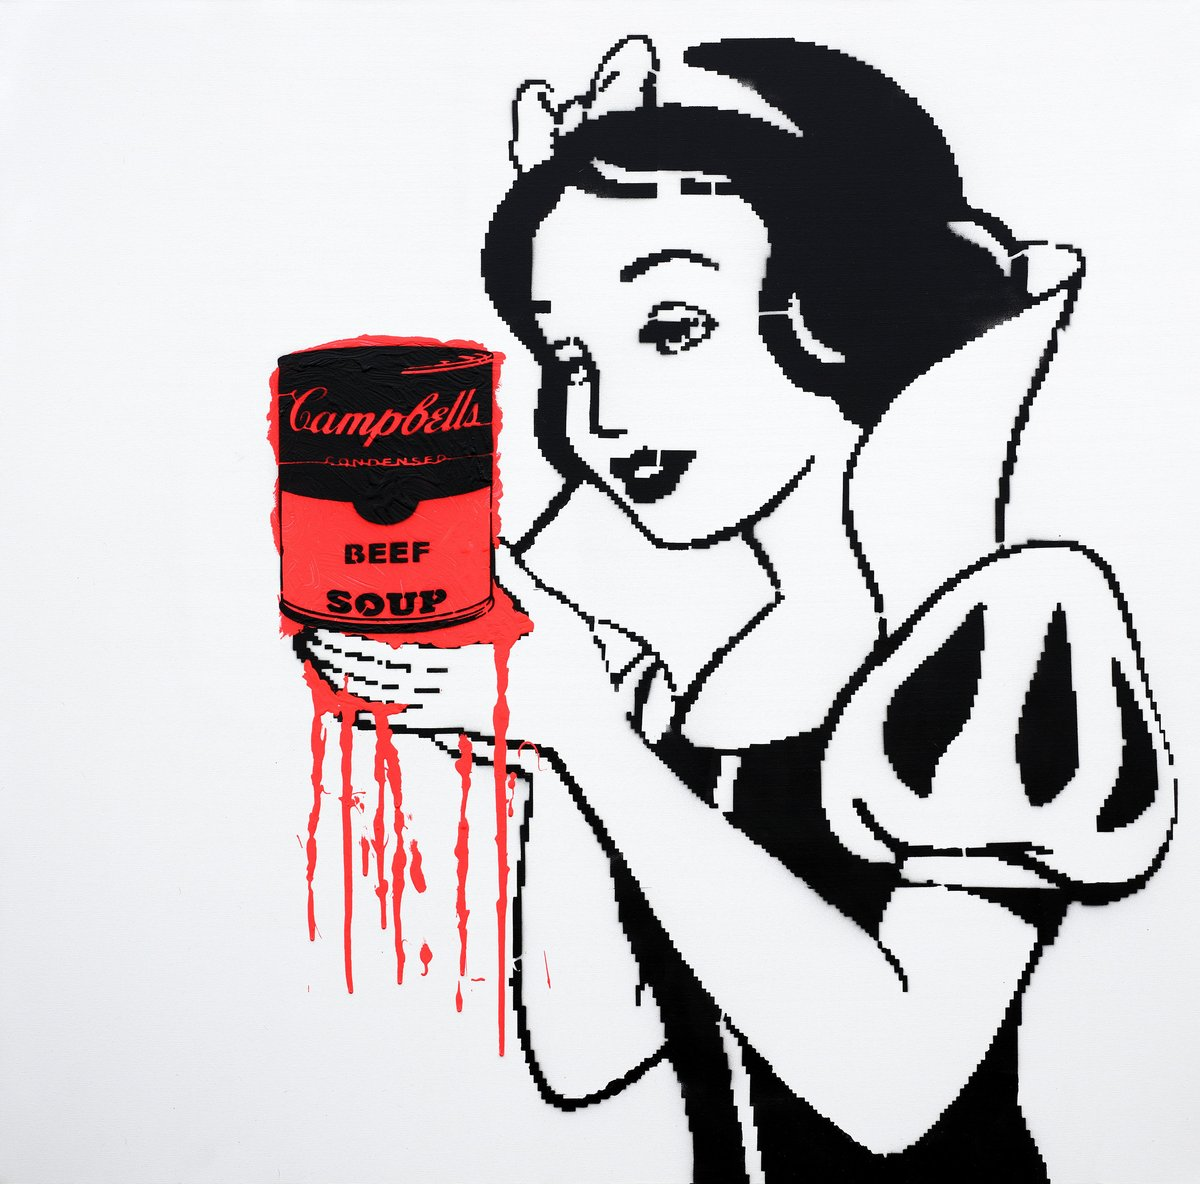 1200x1184 Original Artwork Snow White Holding The Wrong Soup Vegan Club